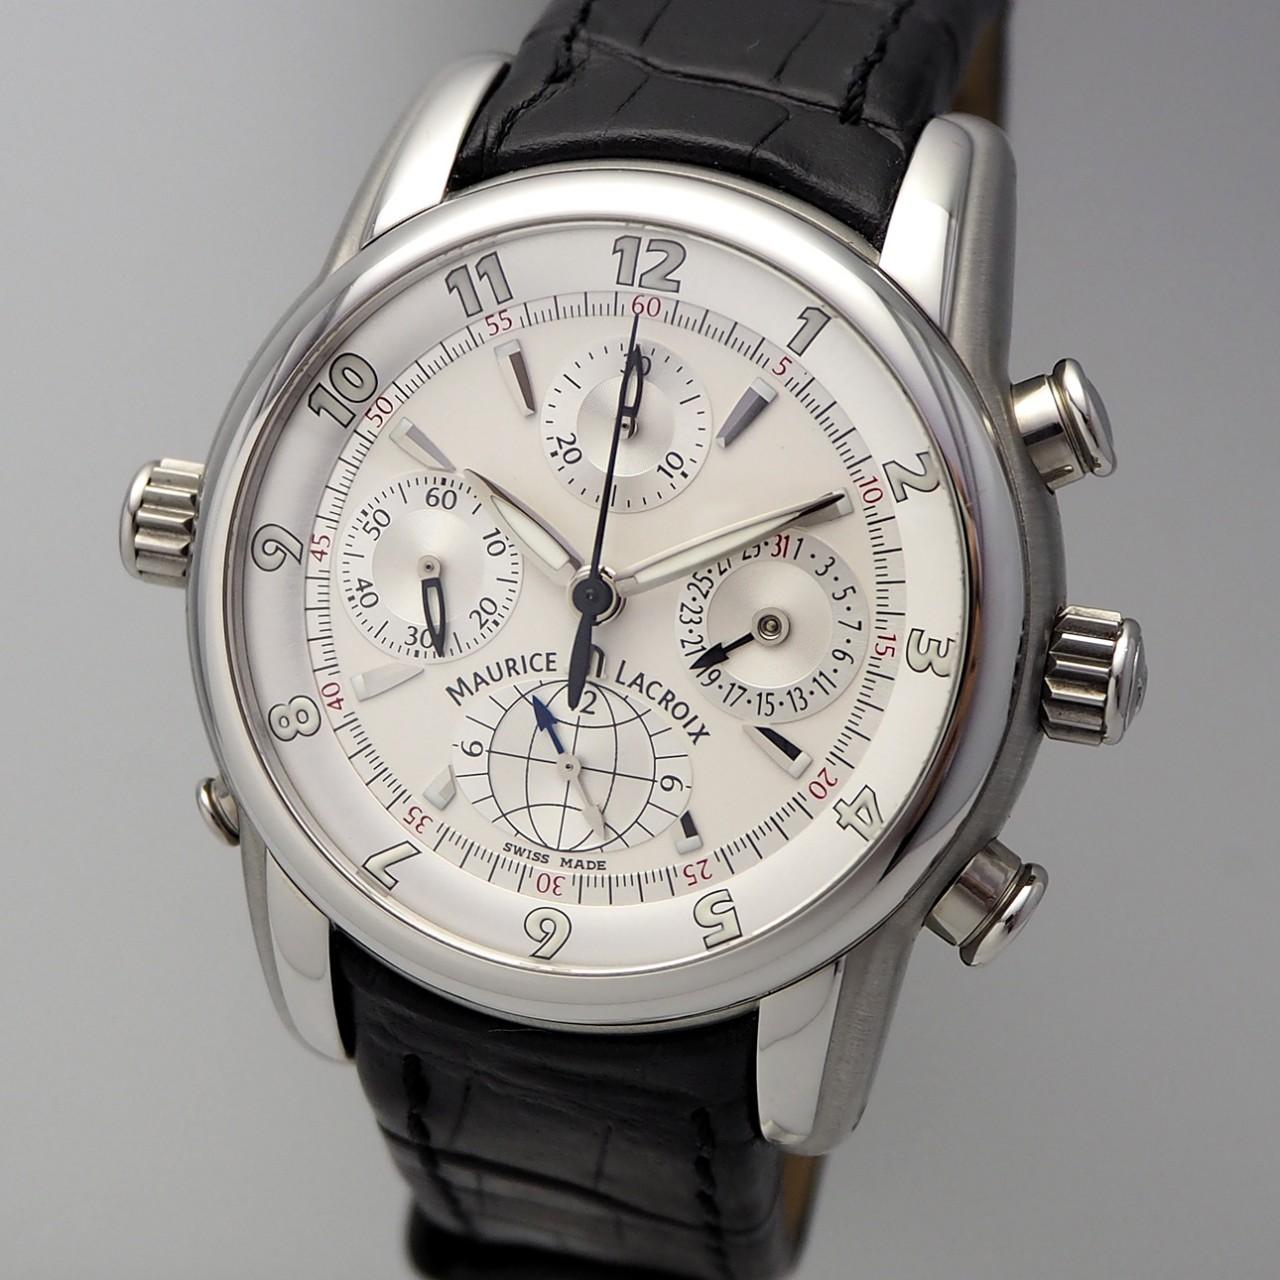 Maurice Lacroix Globe Chronograph -Stahl-Leder, Box und Papiere, ungetragen